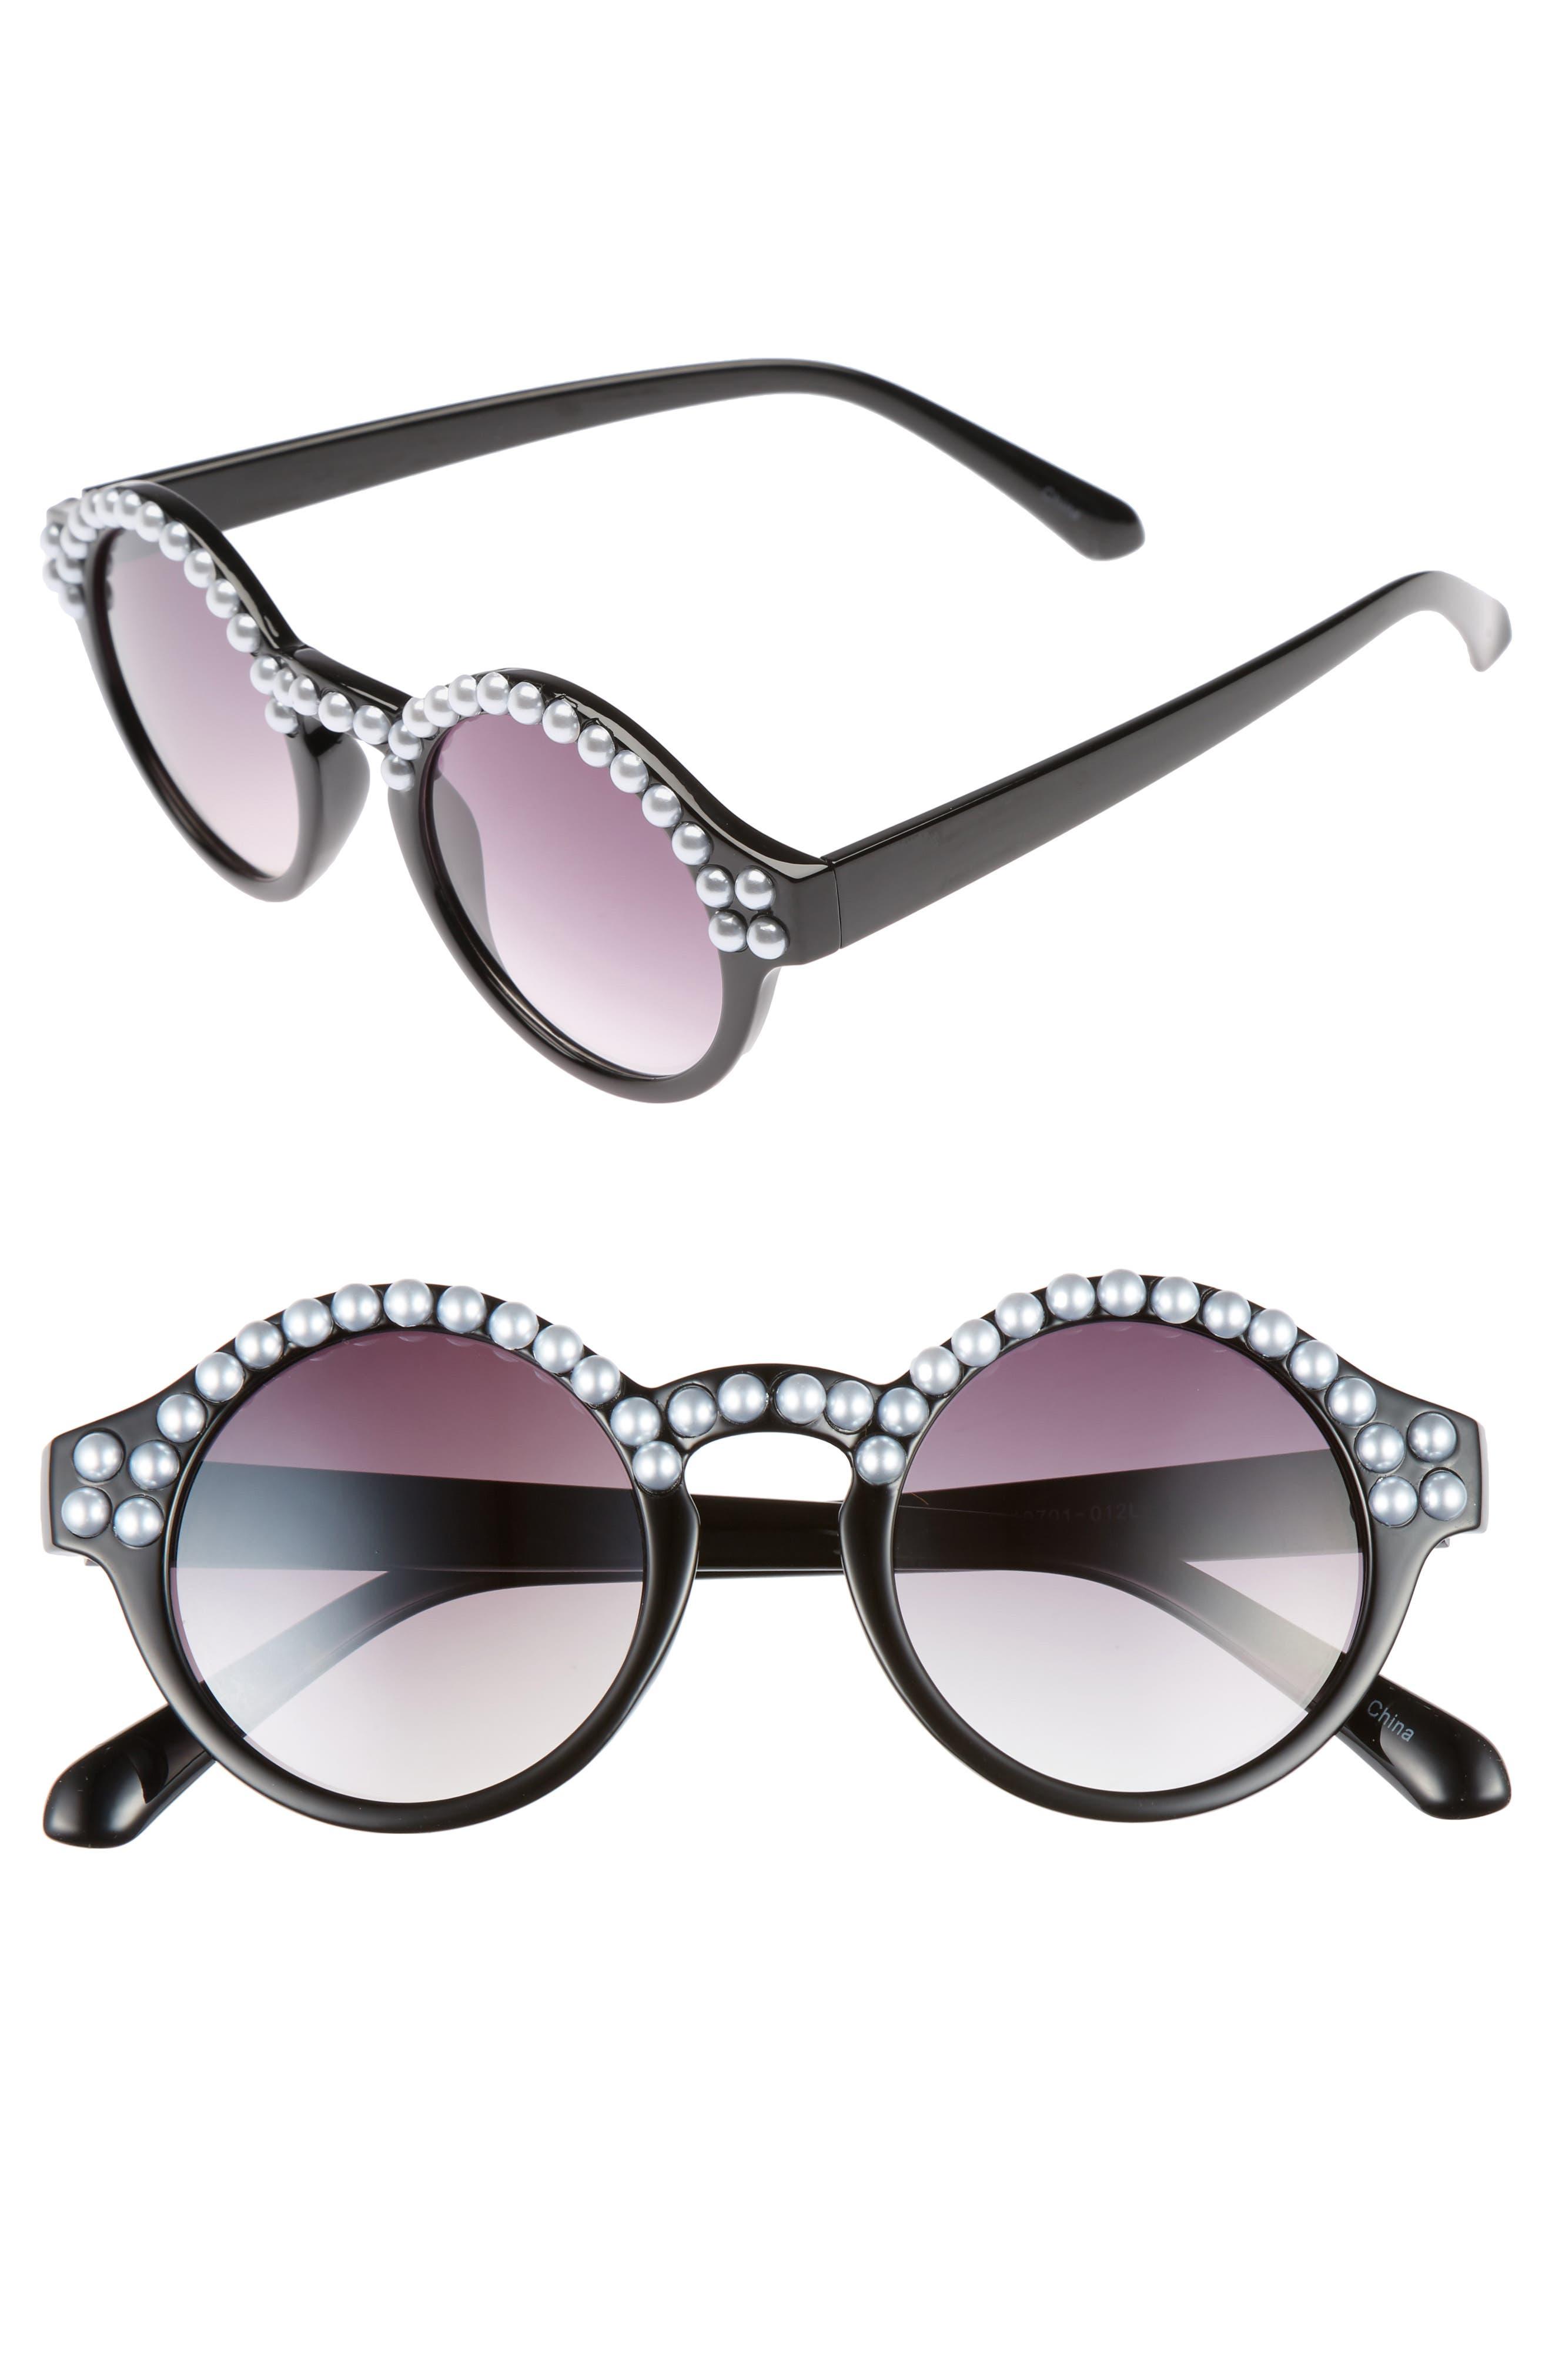 45mm Imitation Pearl Round Sunglasses,                         Main,                         color, Black